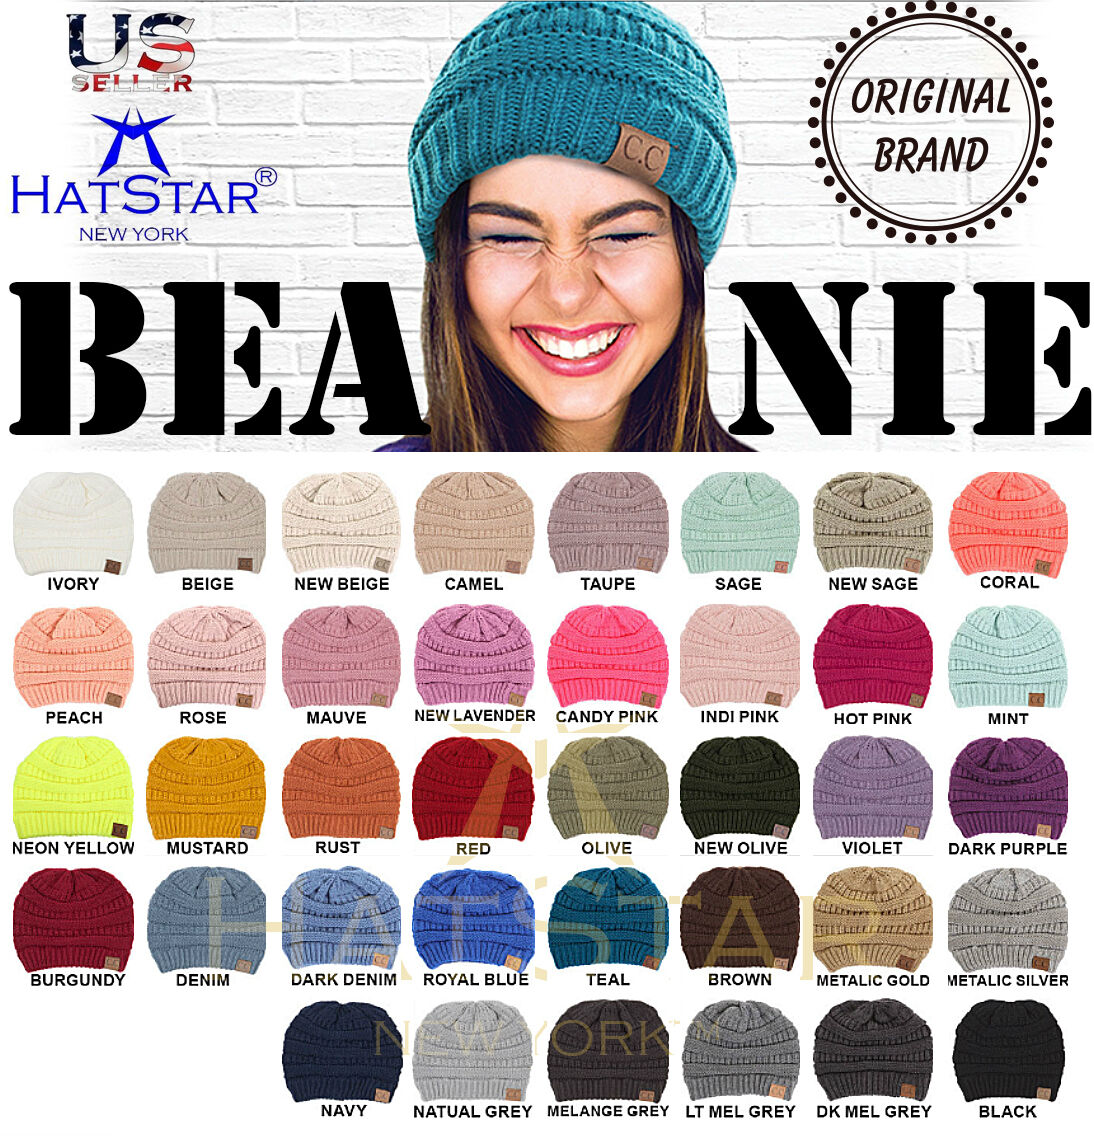 CC C.C Beanie New Women Slouchy Knit Oversized Thick Cap Hat